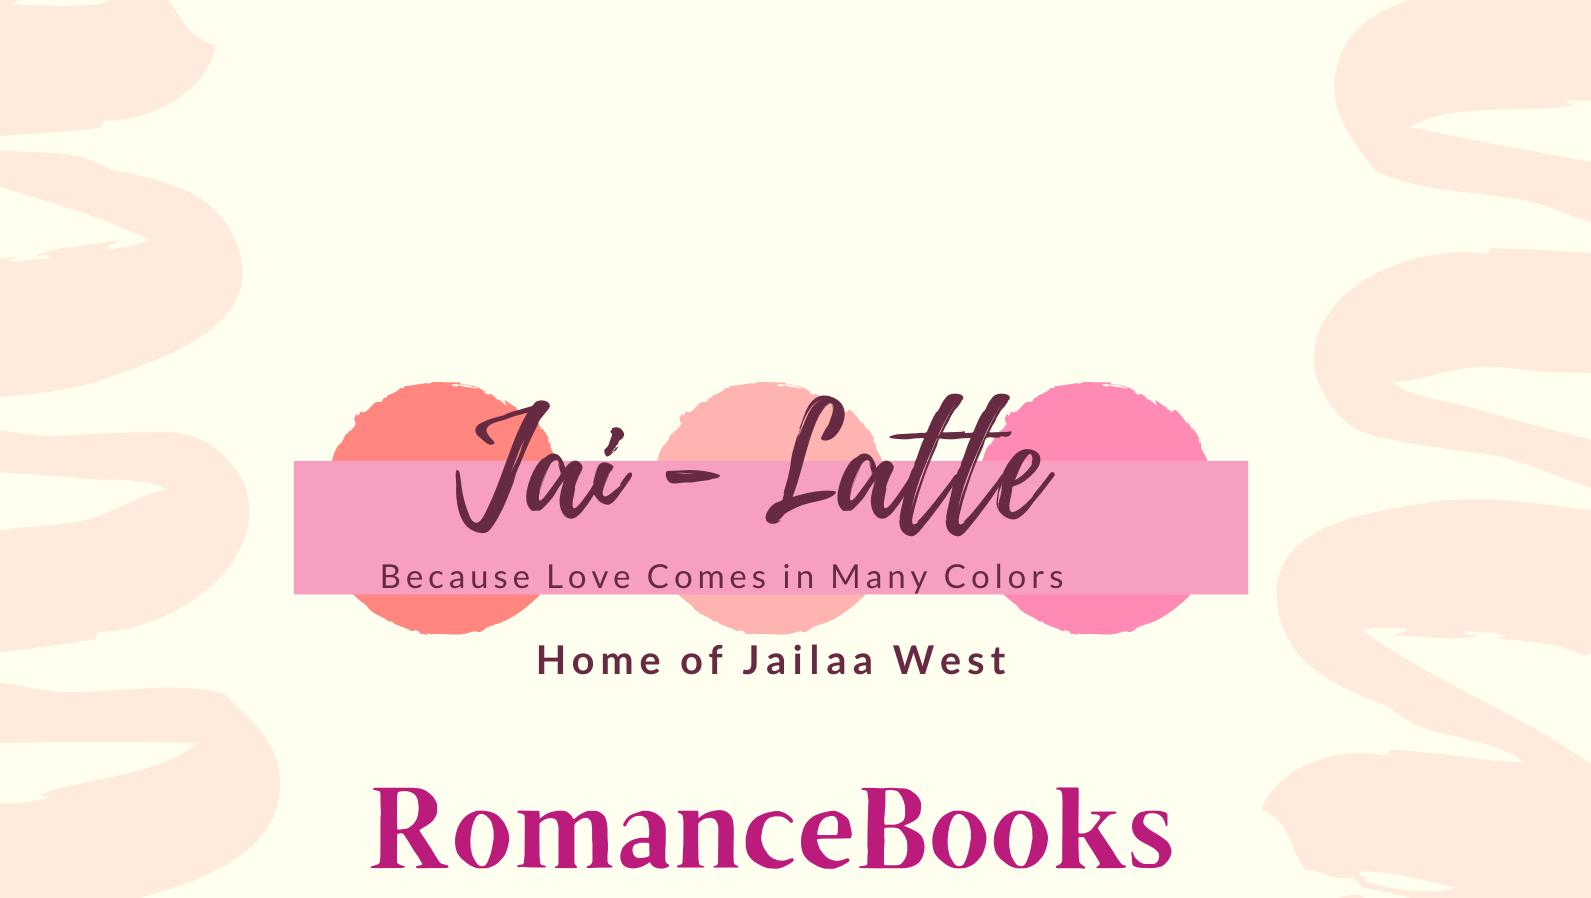 Home of Jailaa West Romance Books